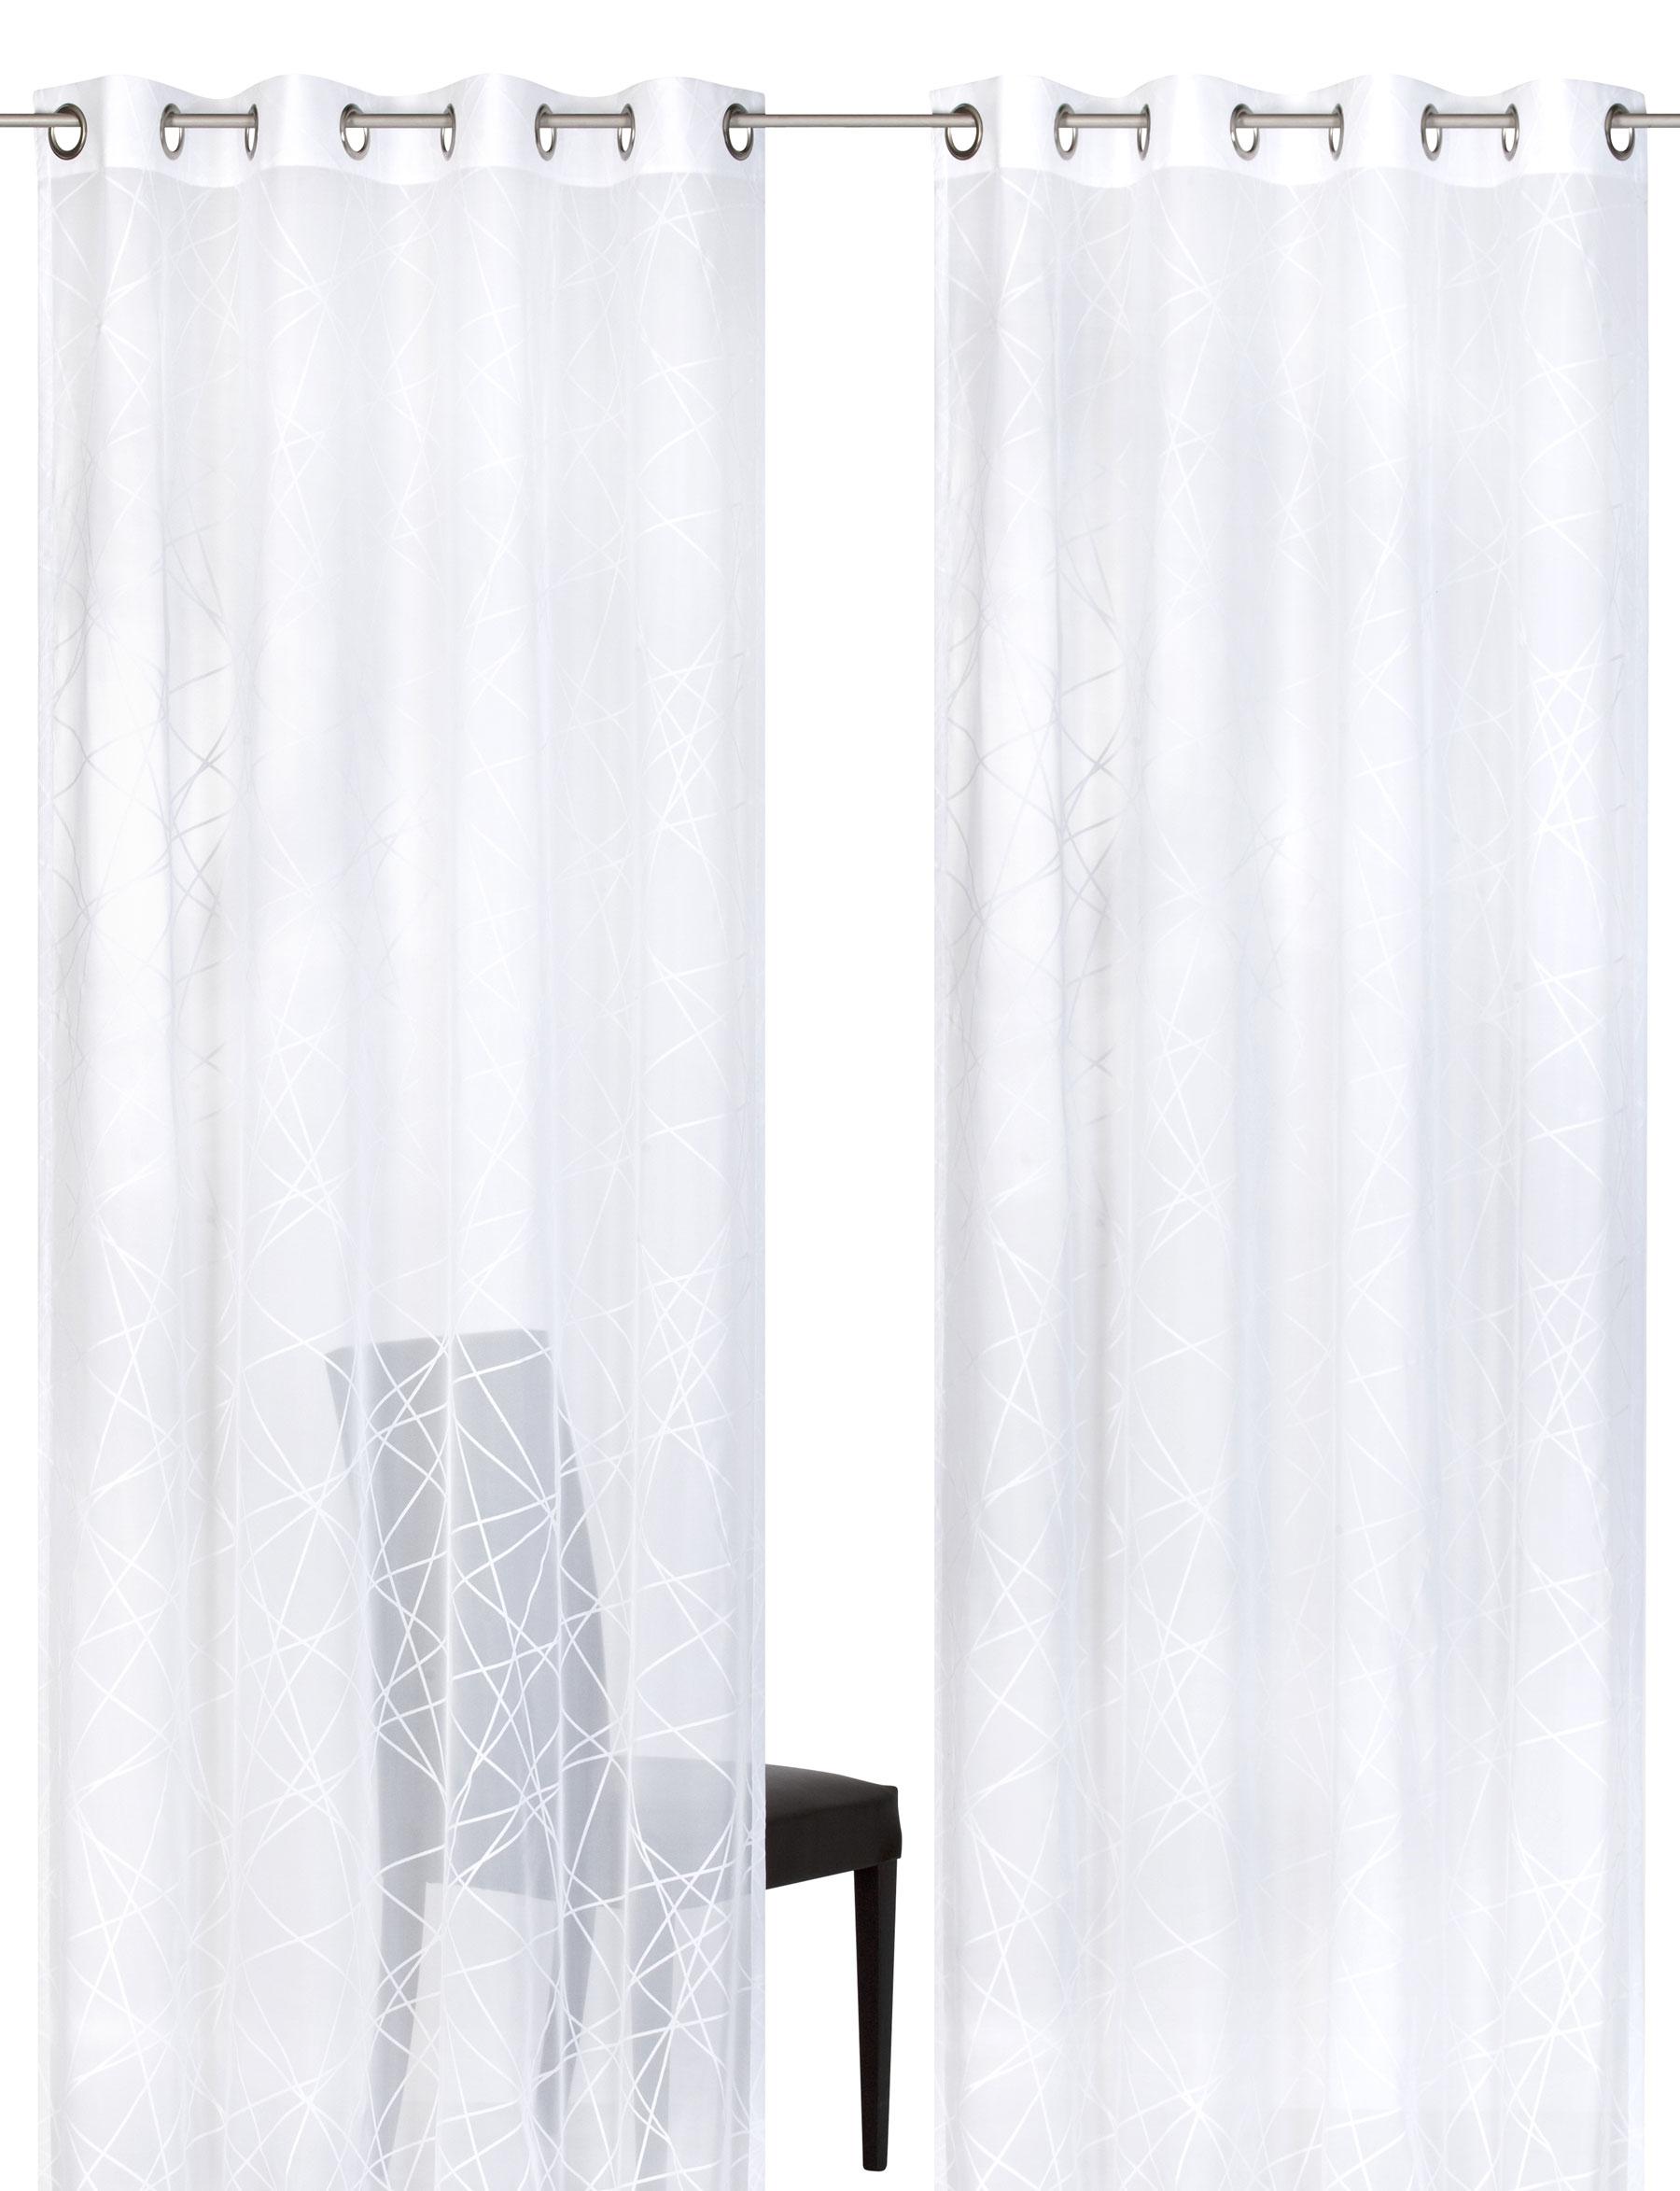 gardinen 255 cm lang in14 hitoiro. Black Bedroom Furniture Sets. Home Design Ideas